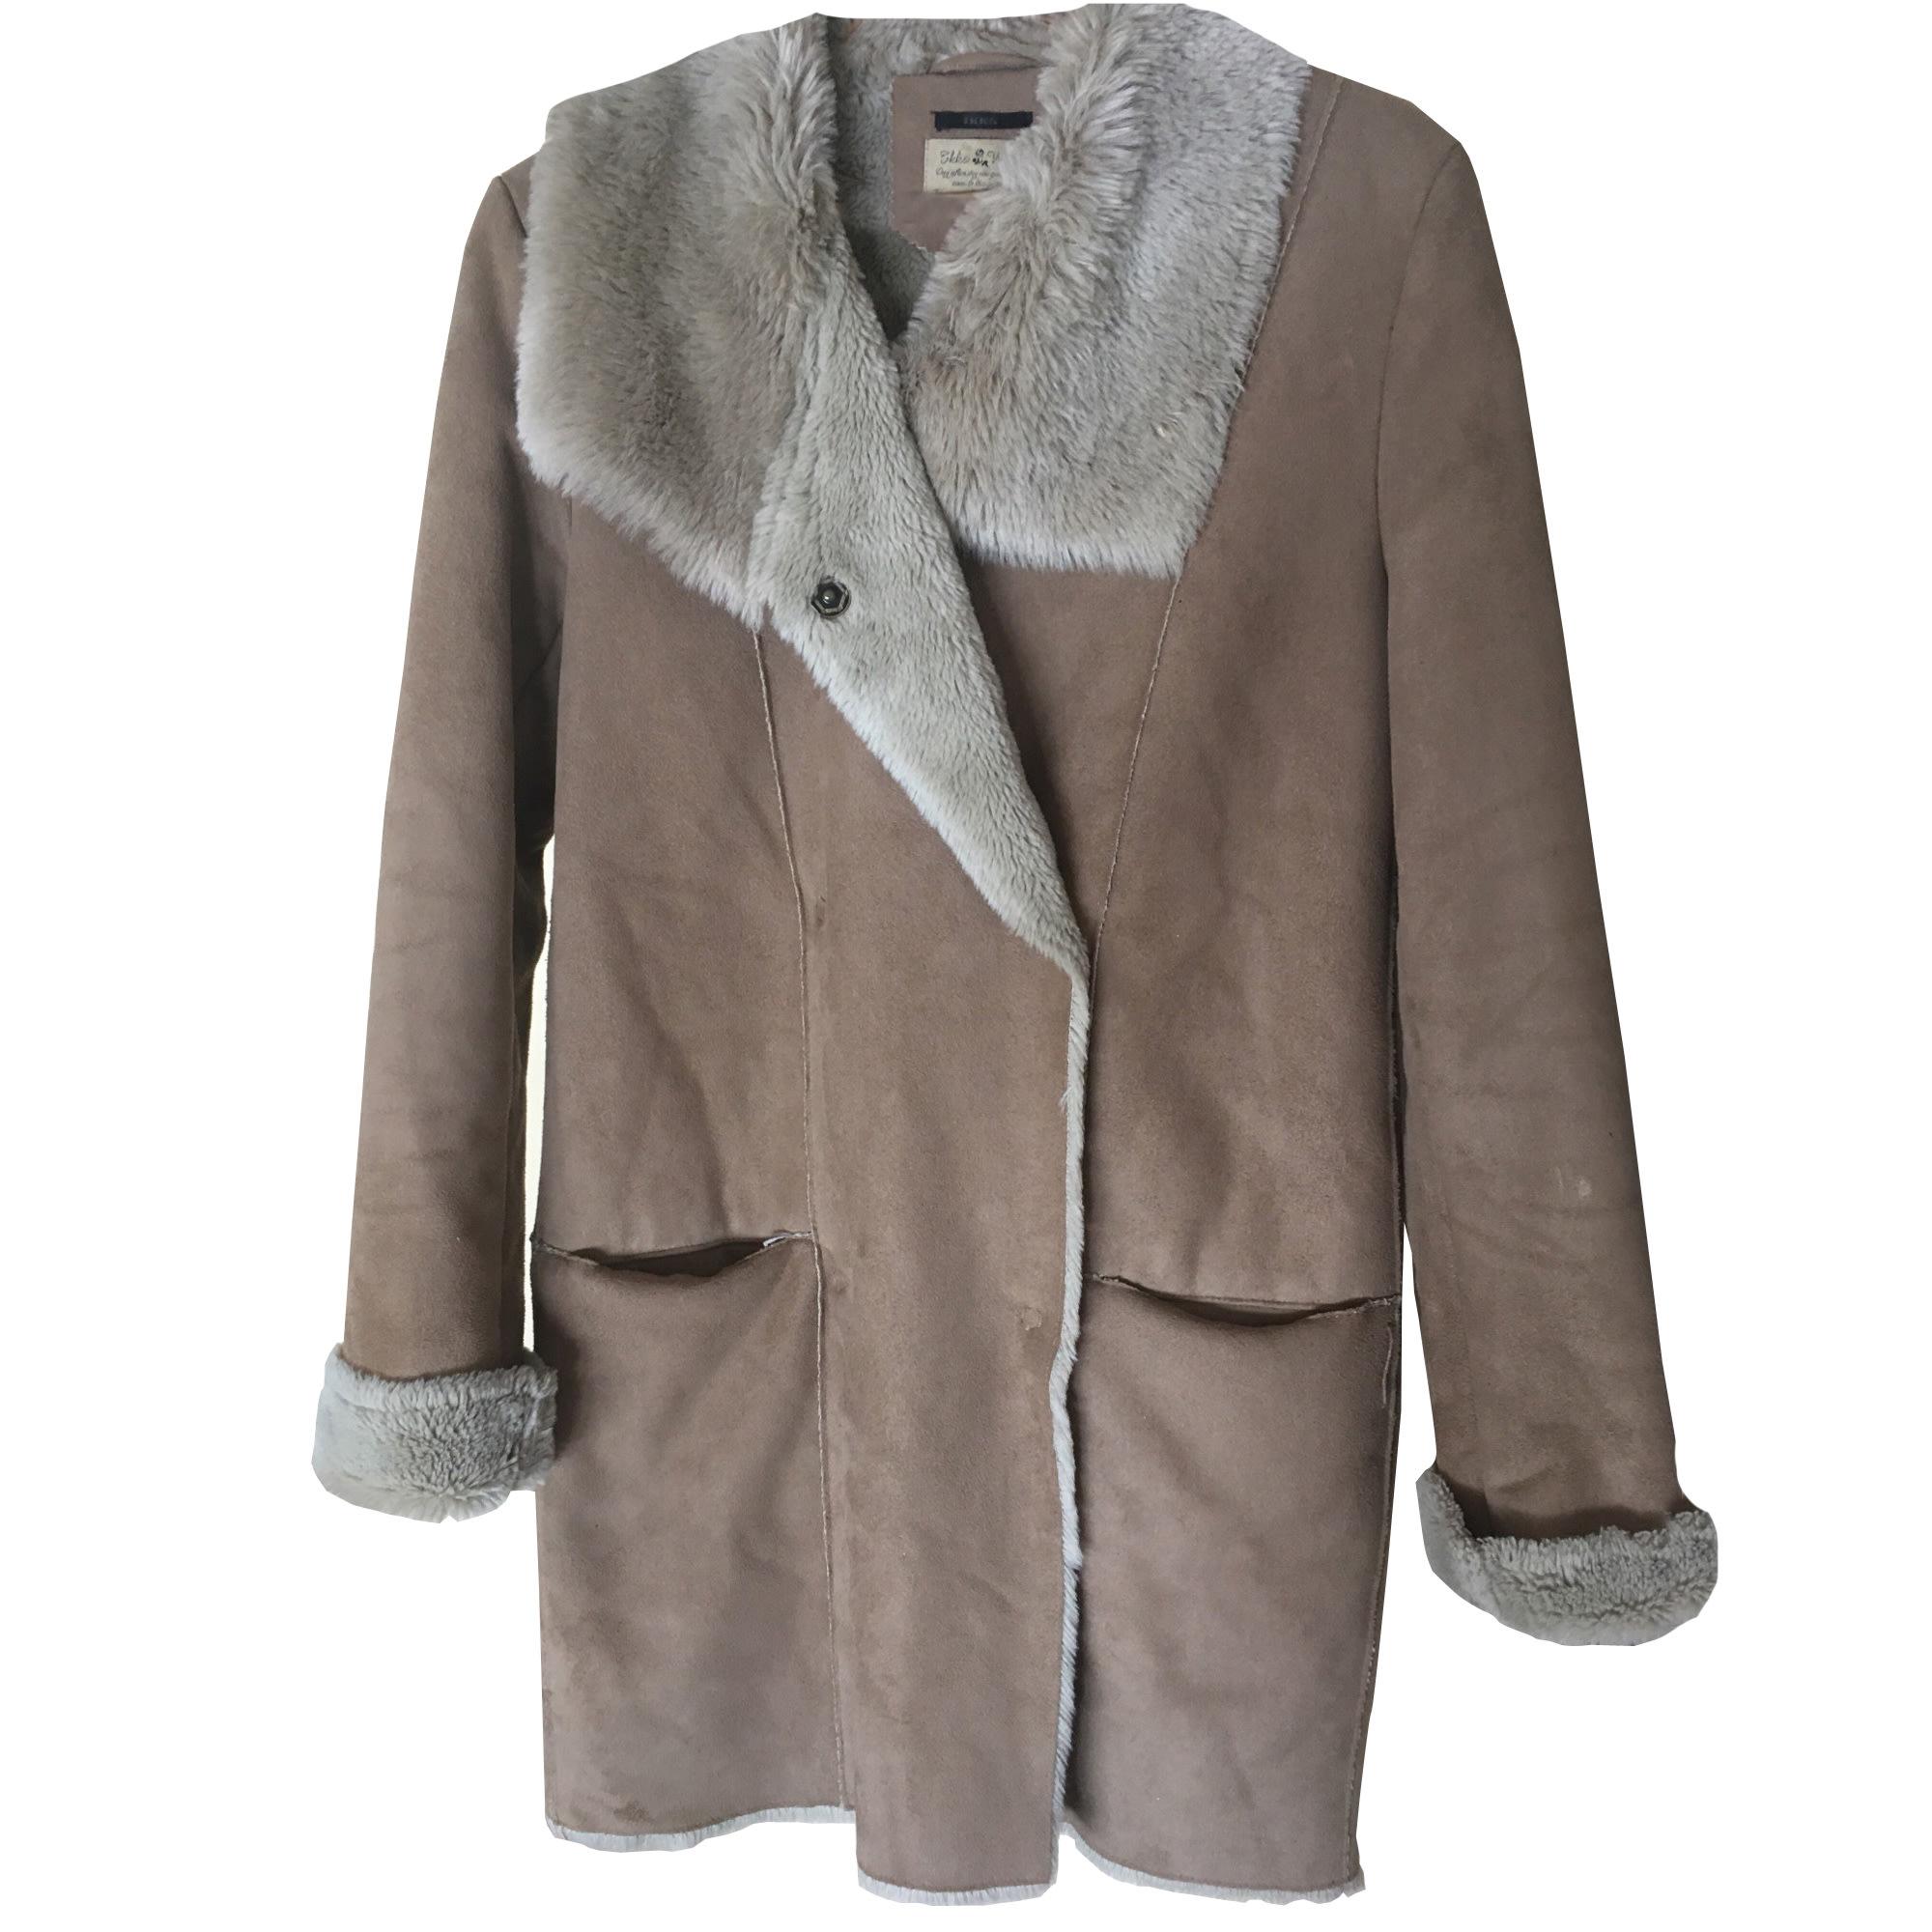 Manteau en fourrure IKKS Beige, camel